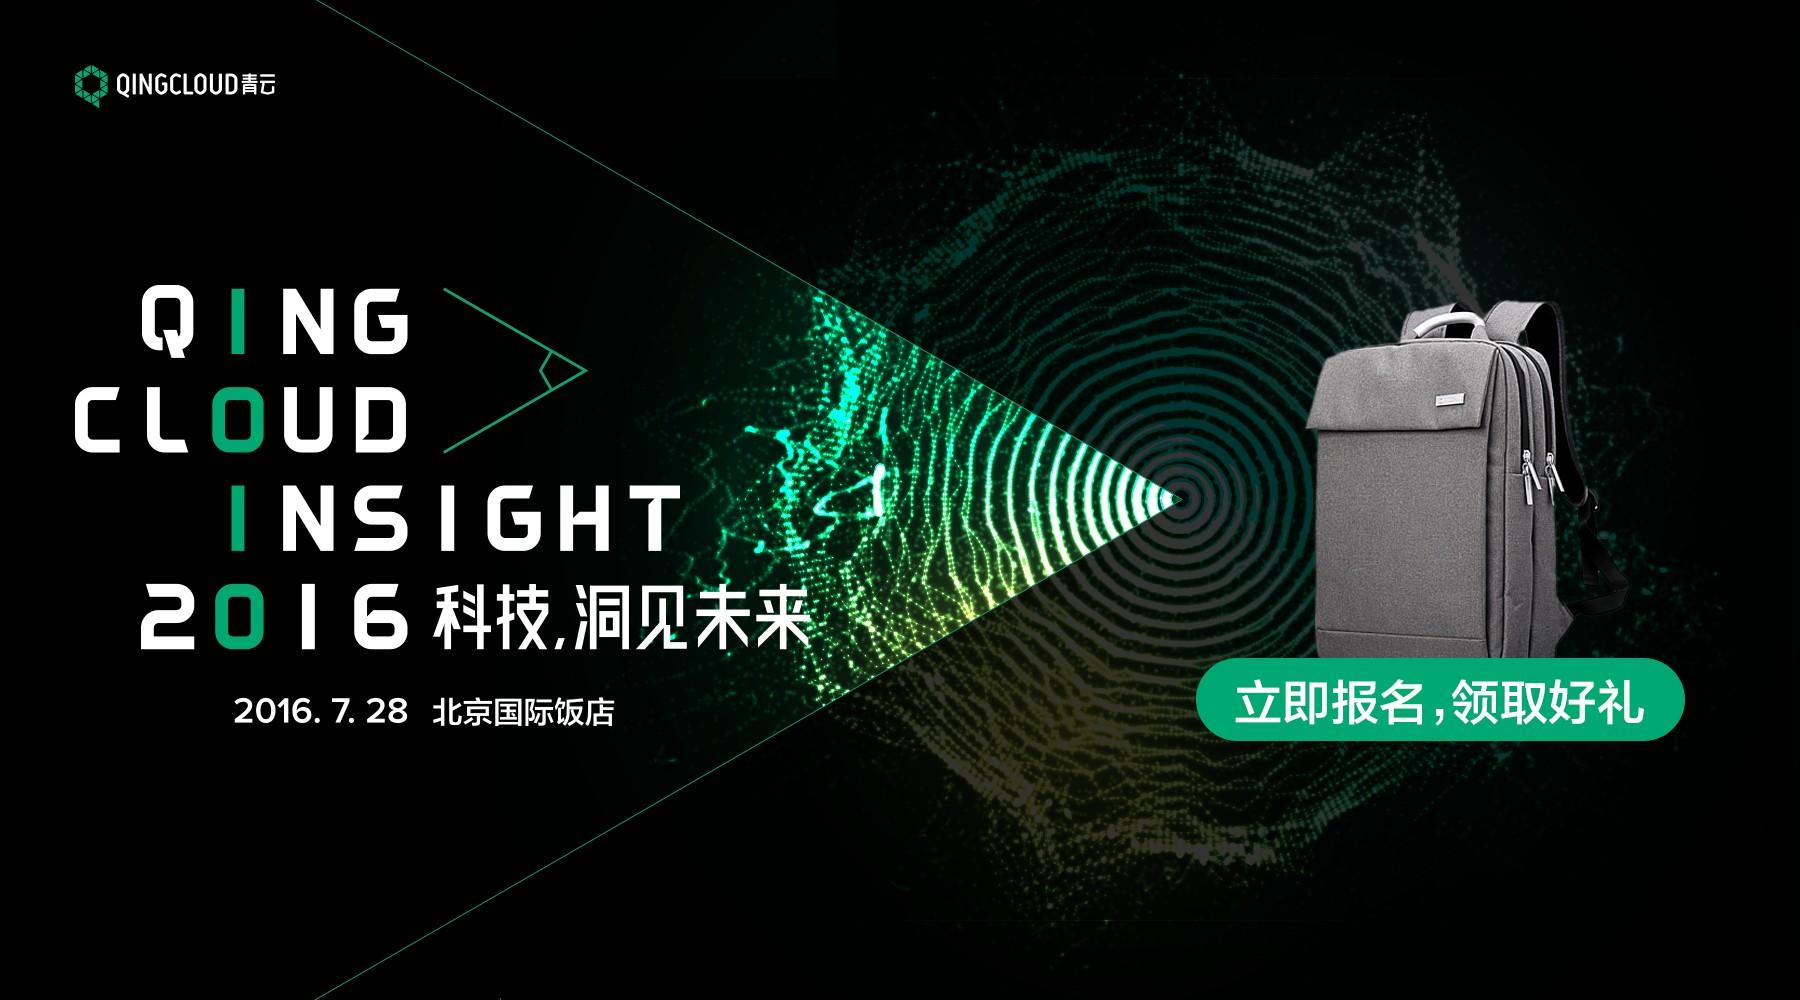 QingCloud Insight,2016科技.洞见未来